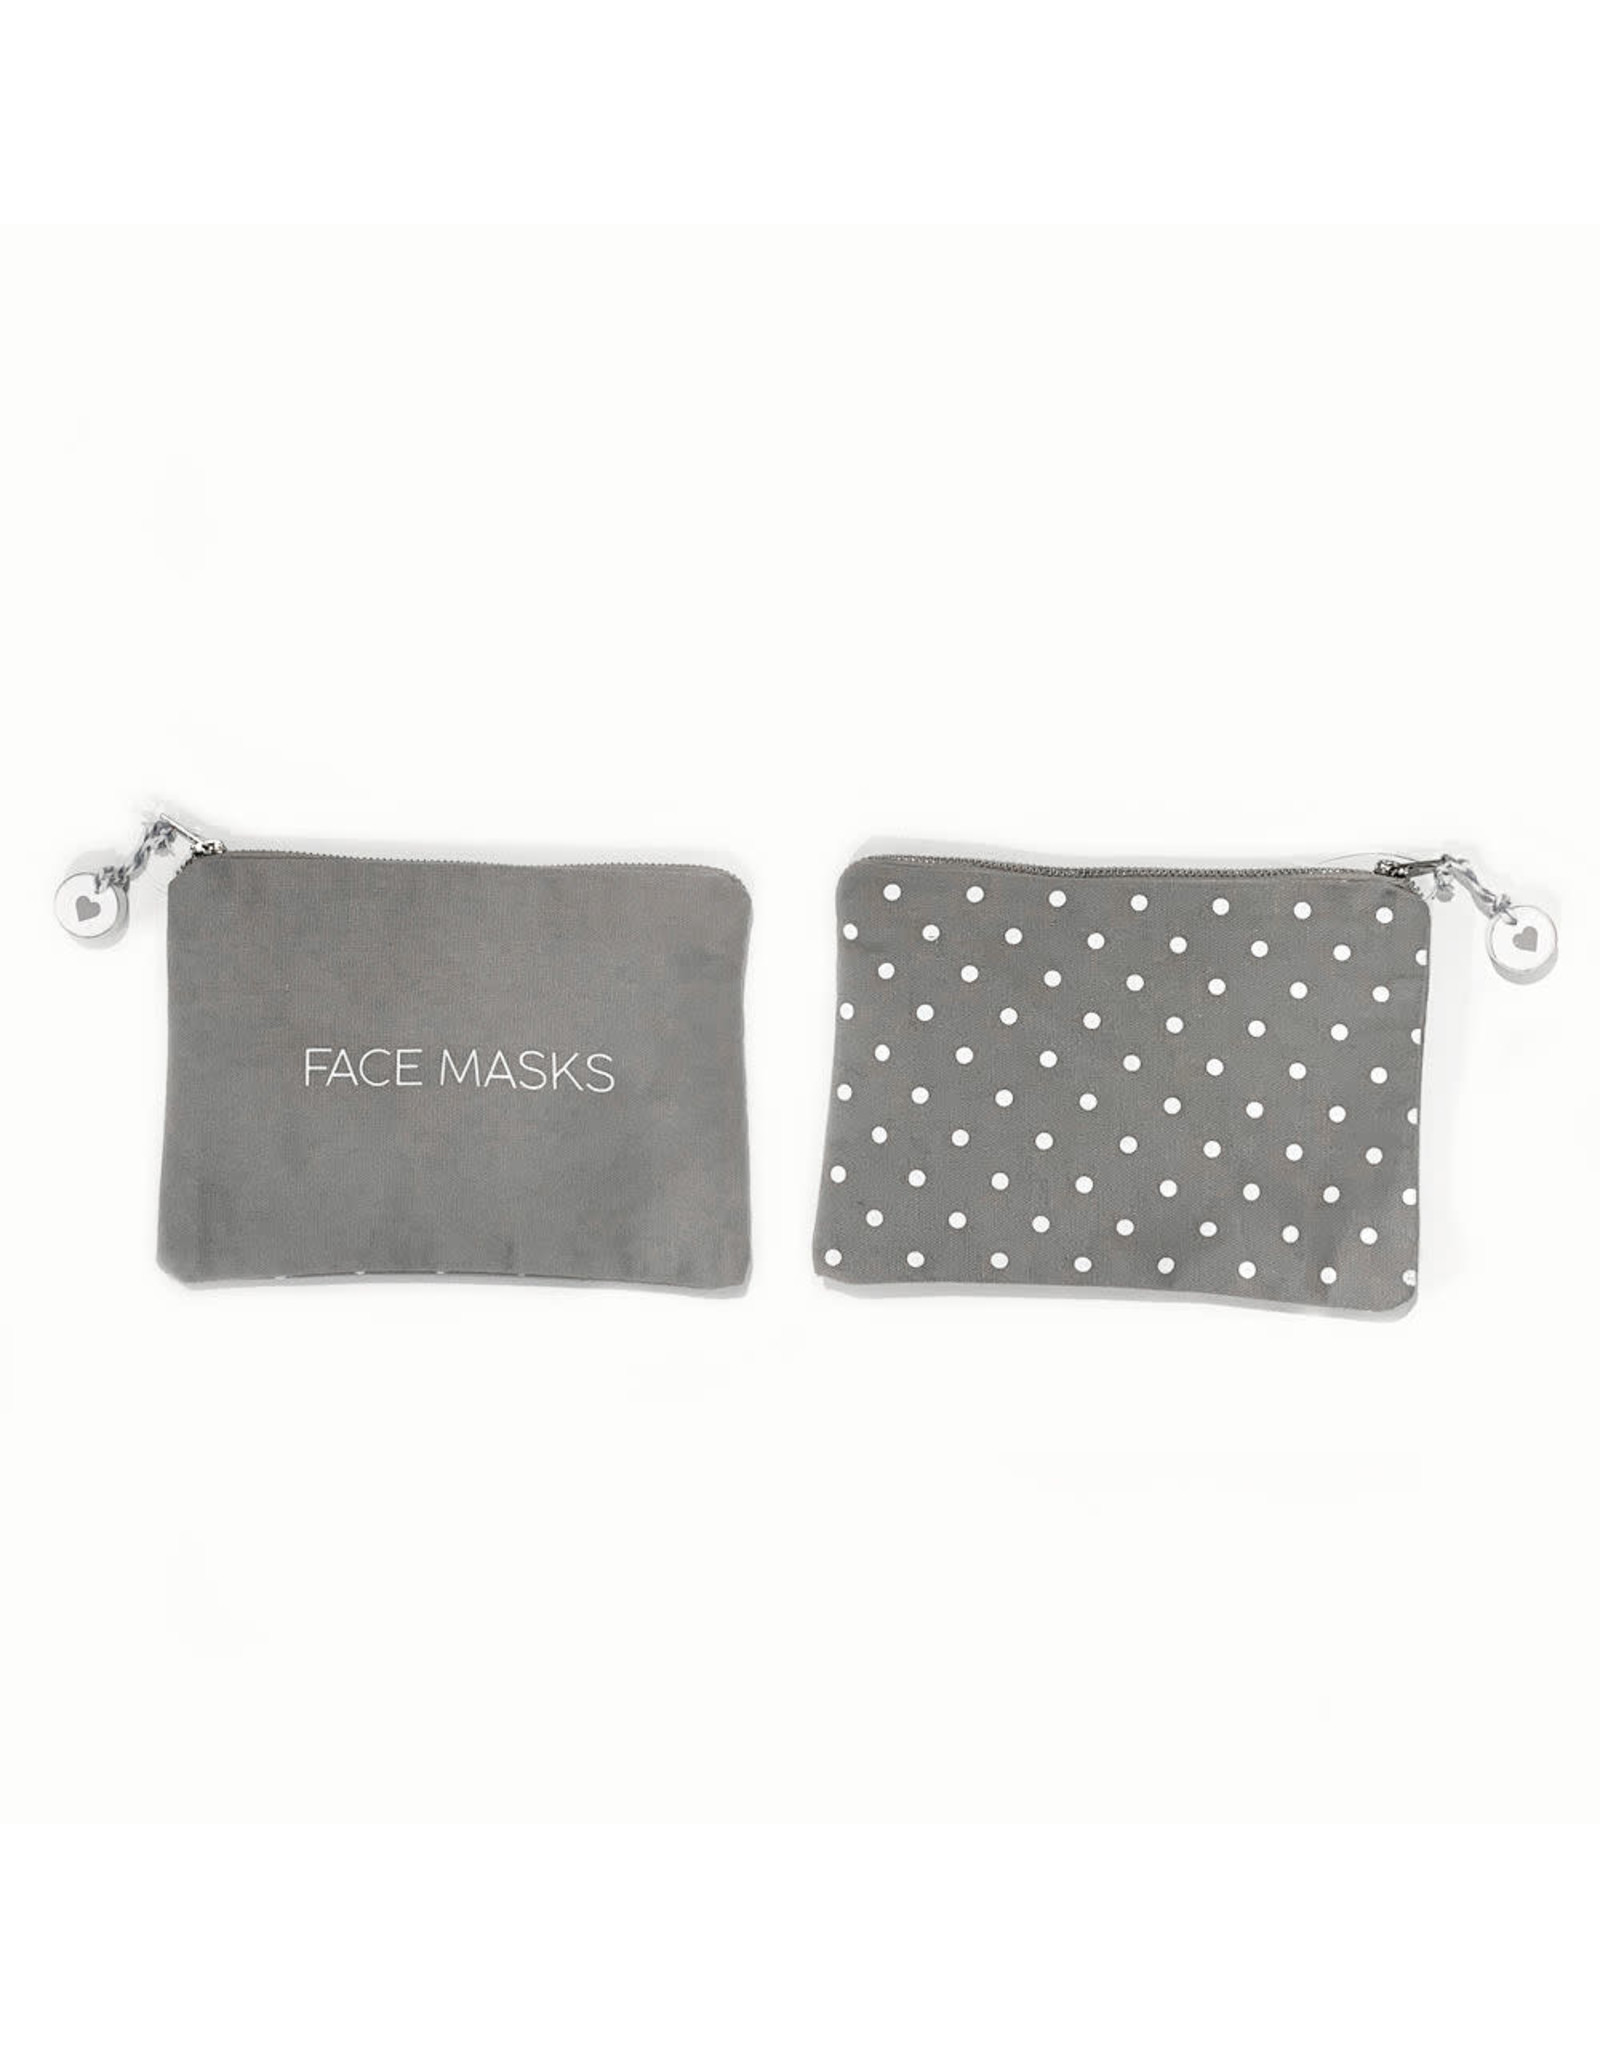 Adams & Co. Canvas Bag Face Masks (FCE) gy/wh